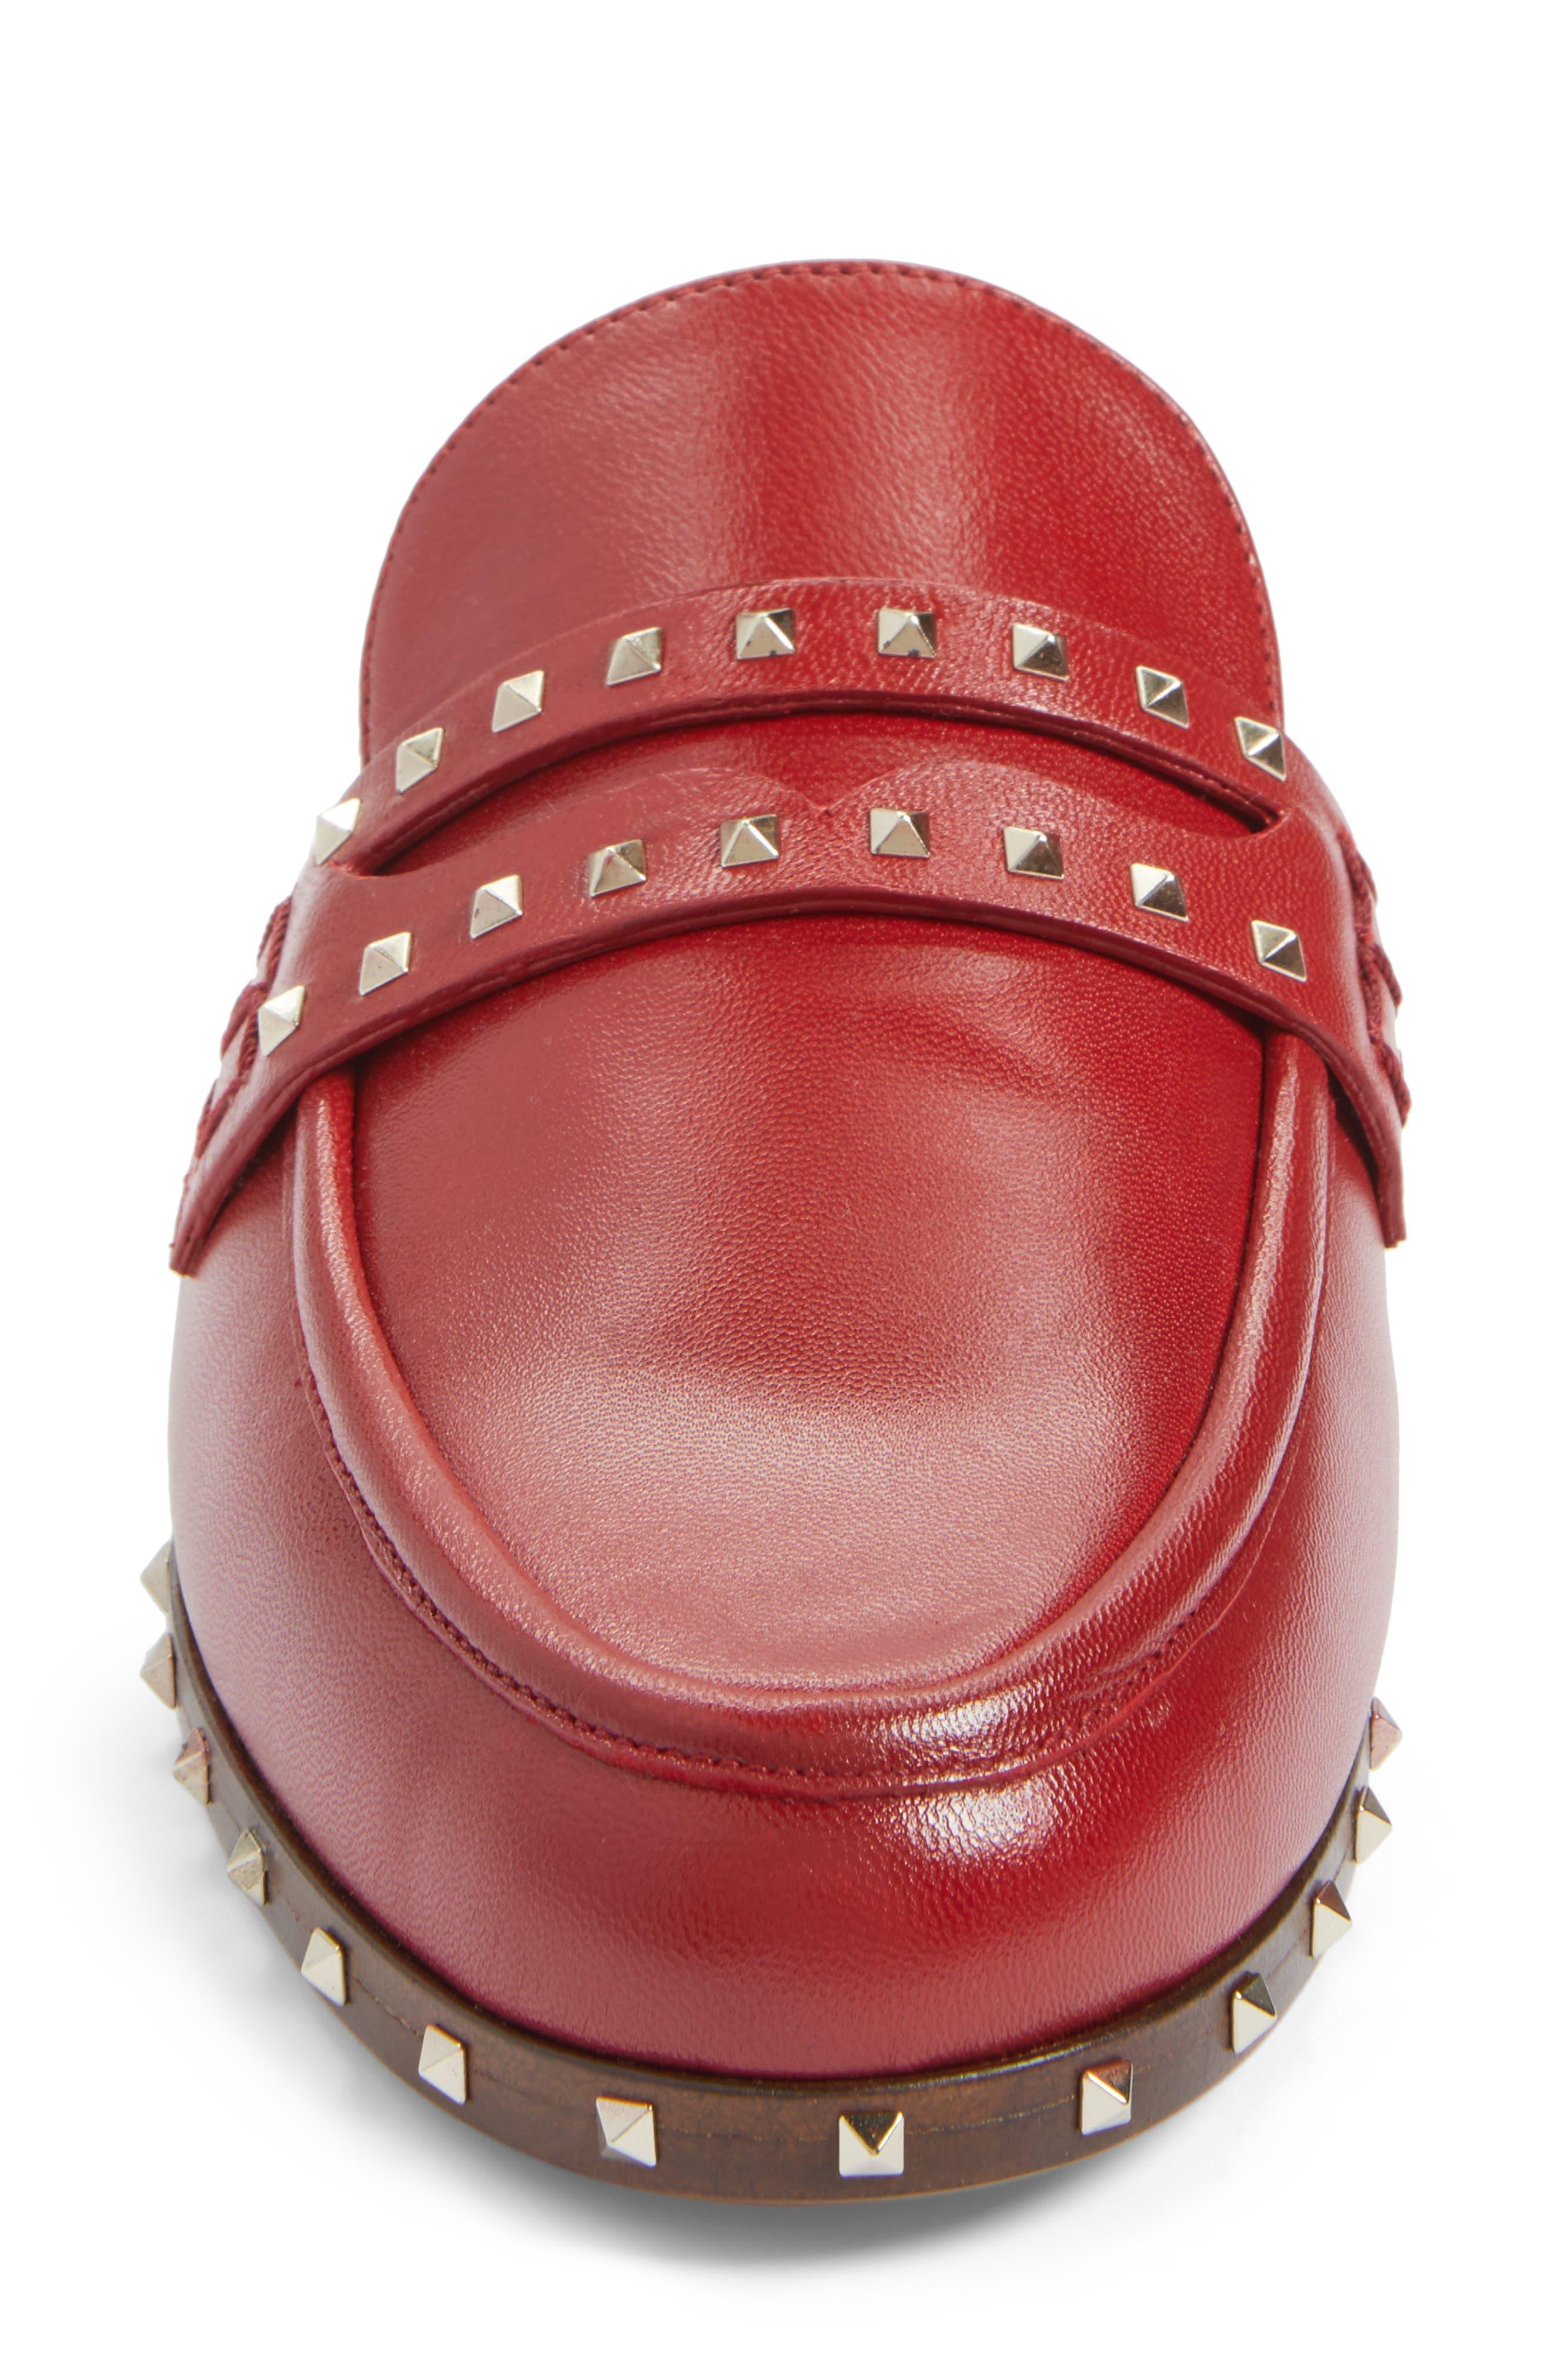 Soul Rockstud Loafer Mule,                             Alternate thumbnail 4, color,                             Red Leather